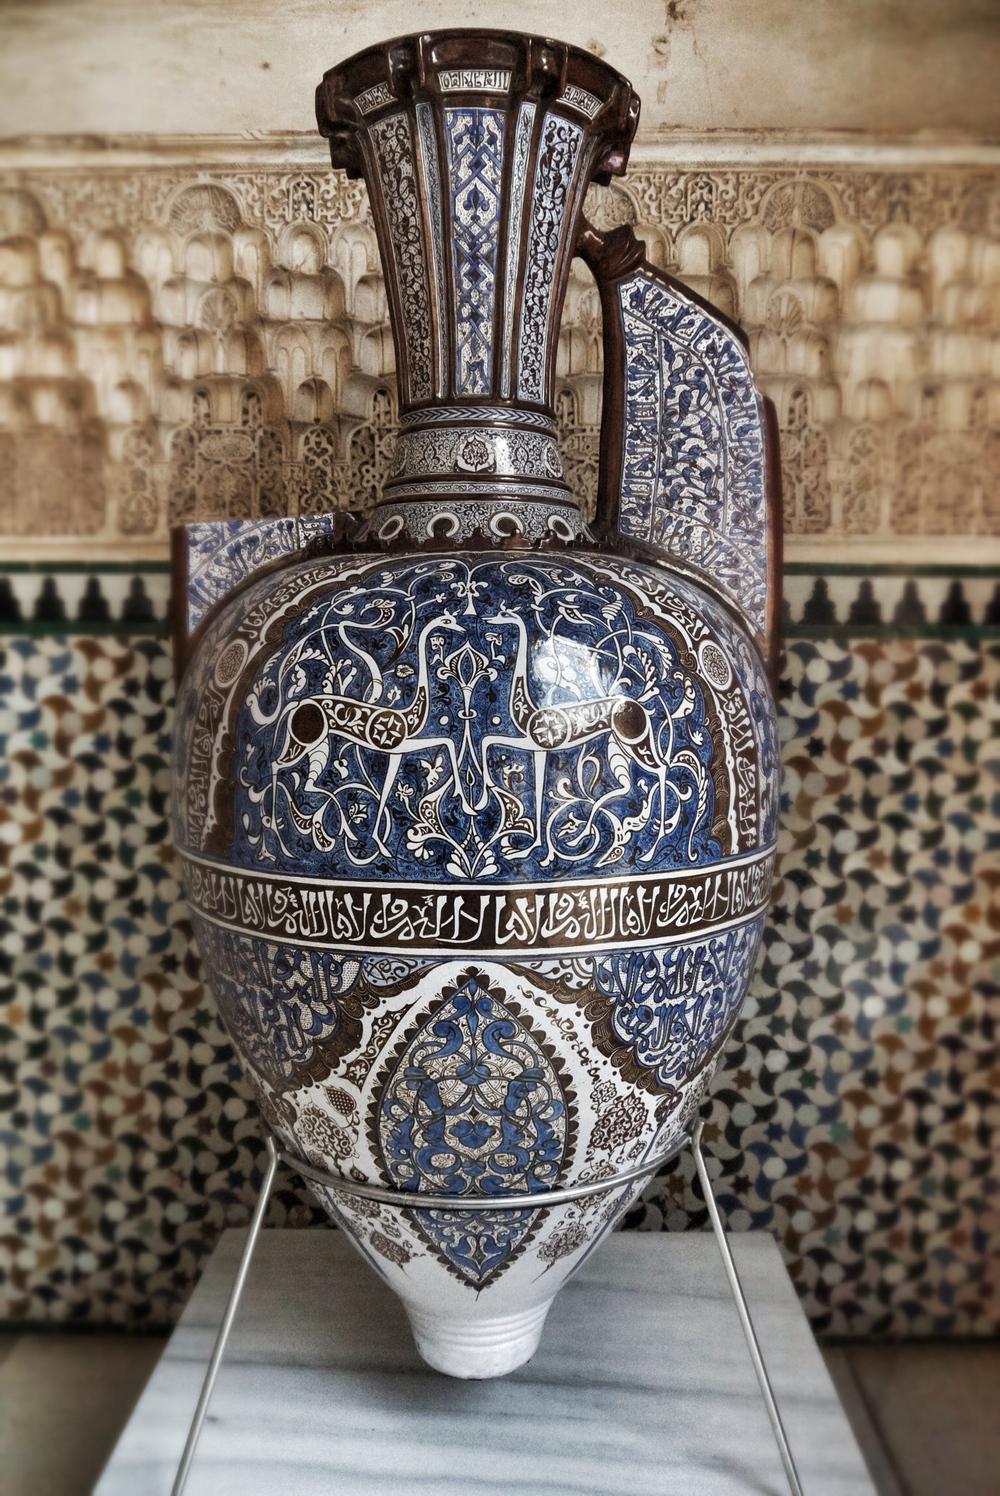 A replica of the famous Gazelle vase